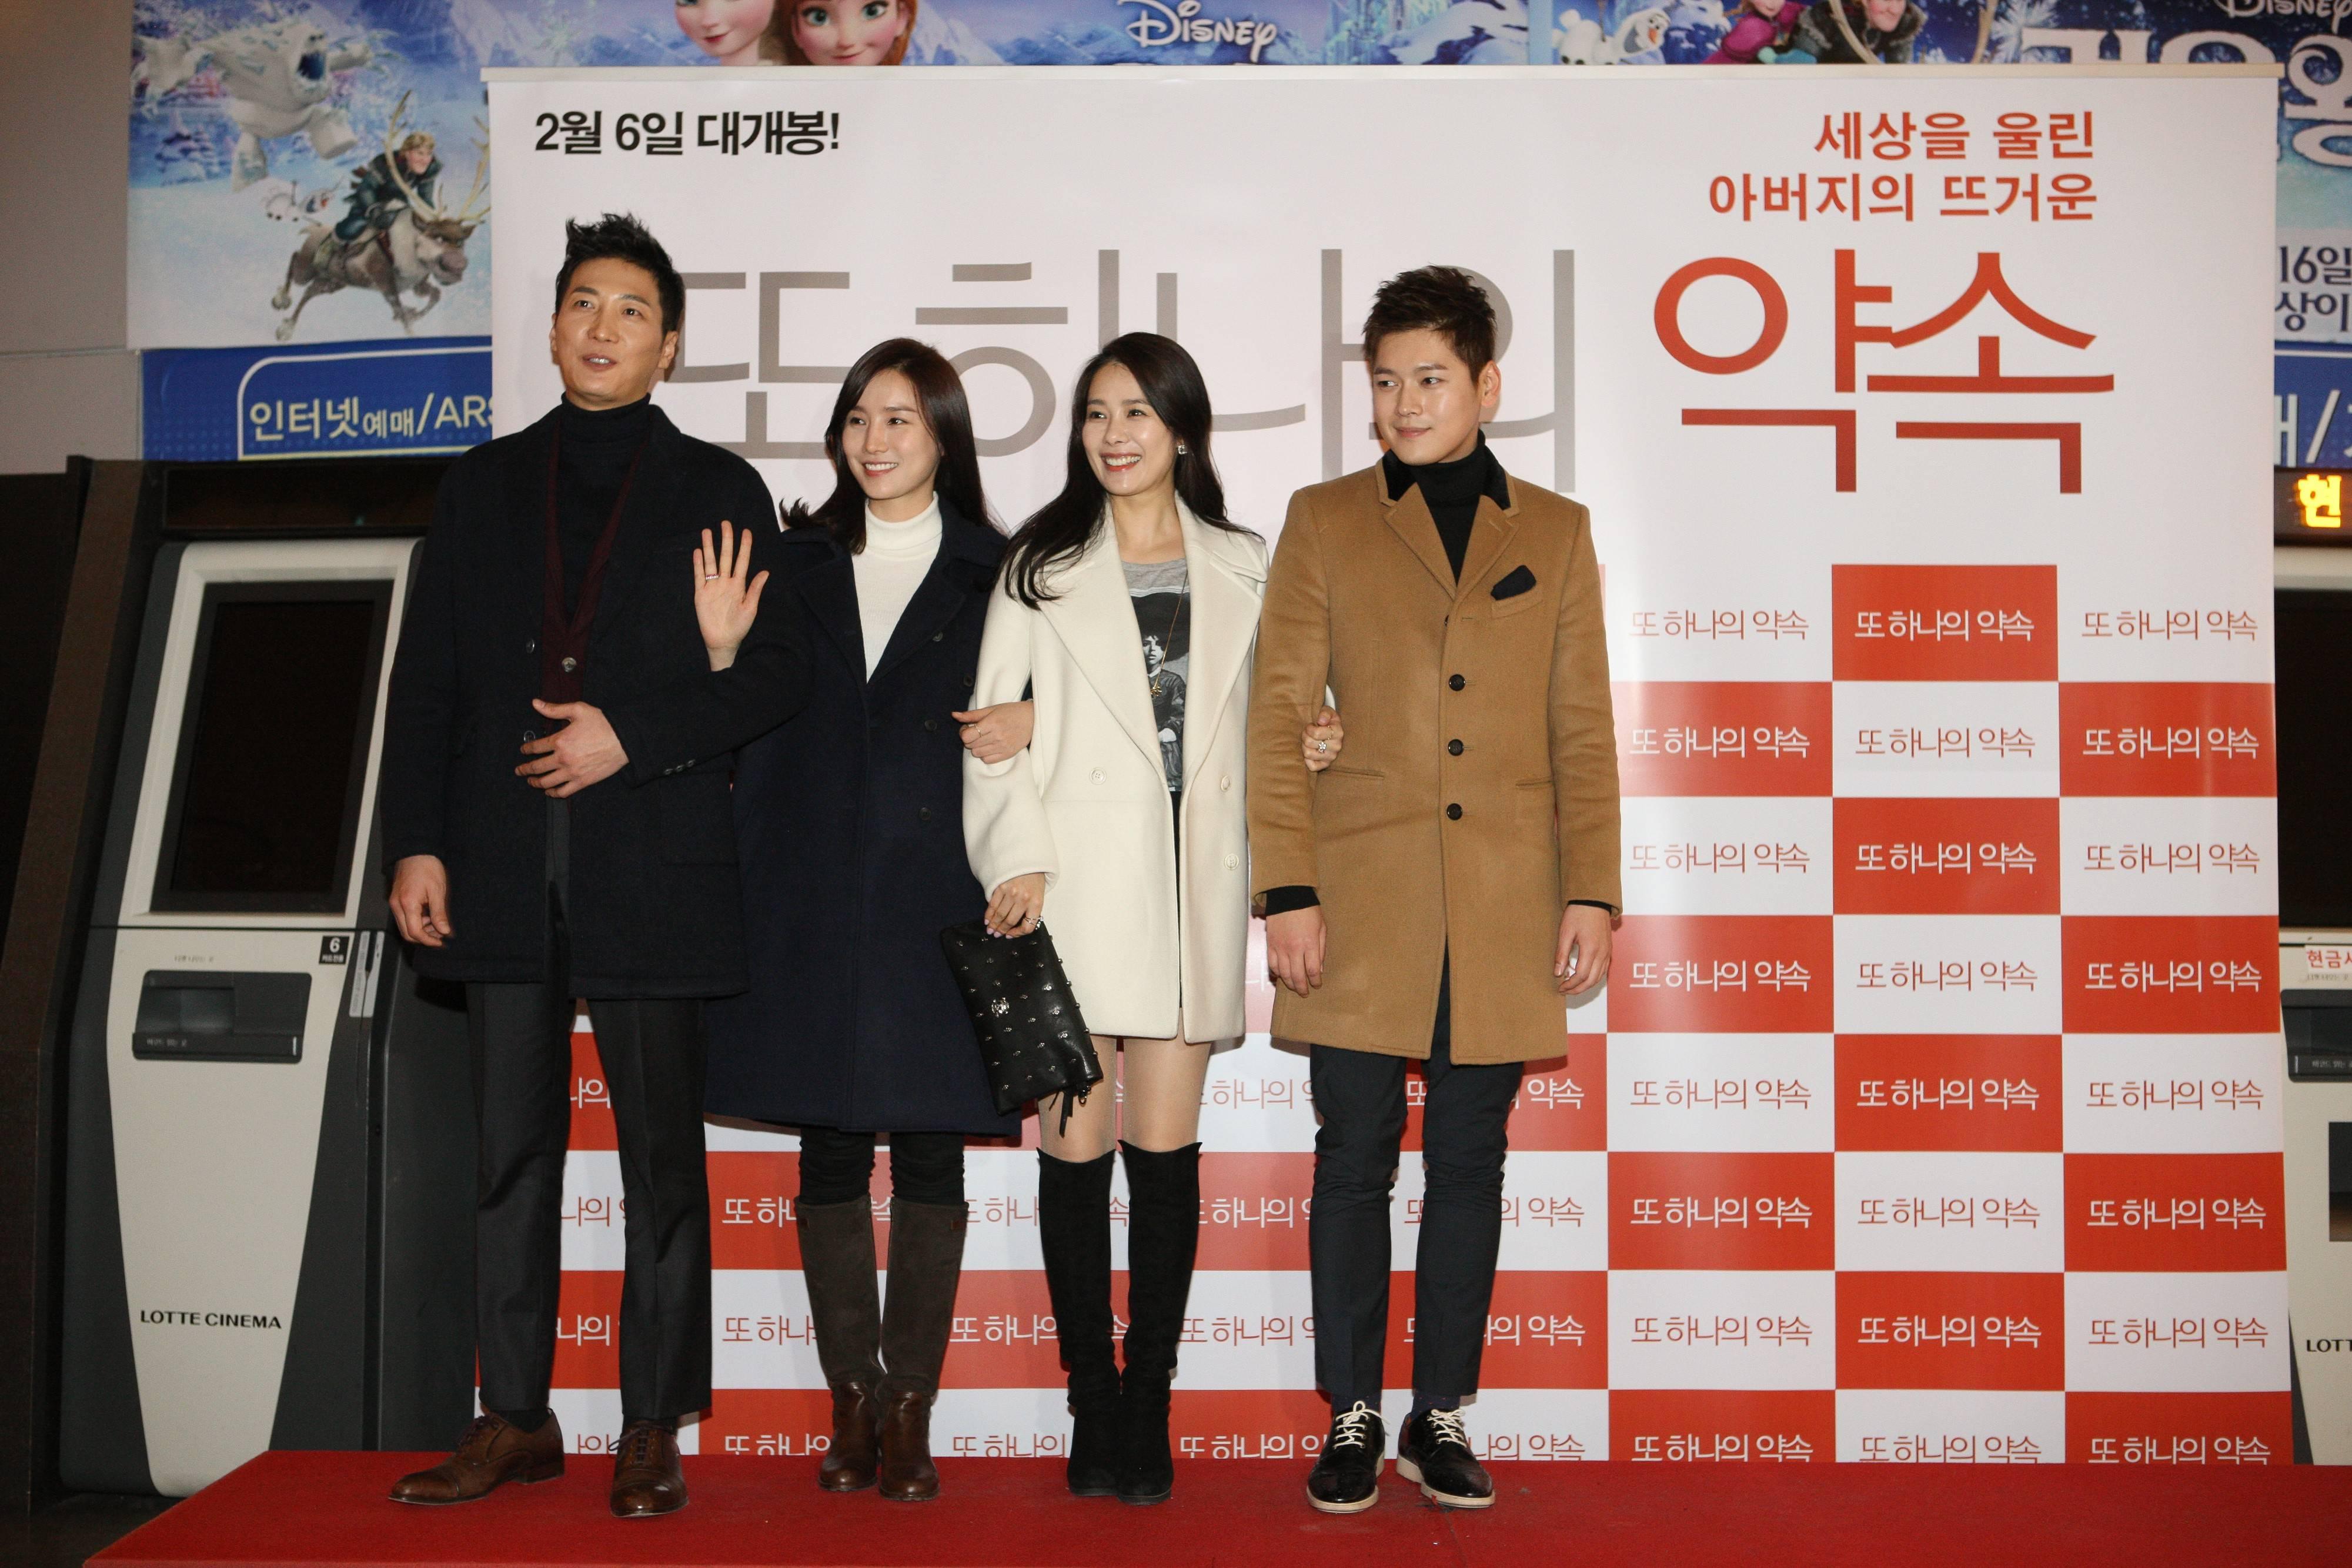 Hwangbo and yunho dating